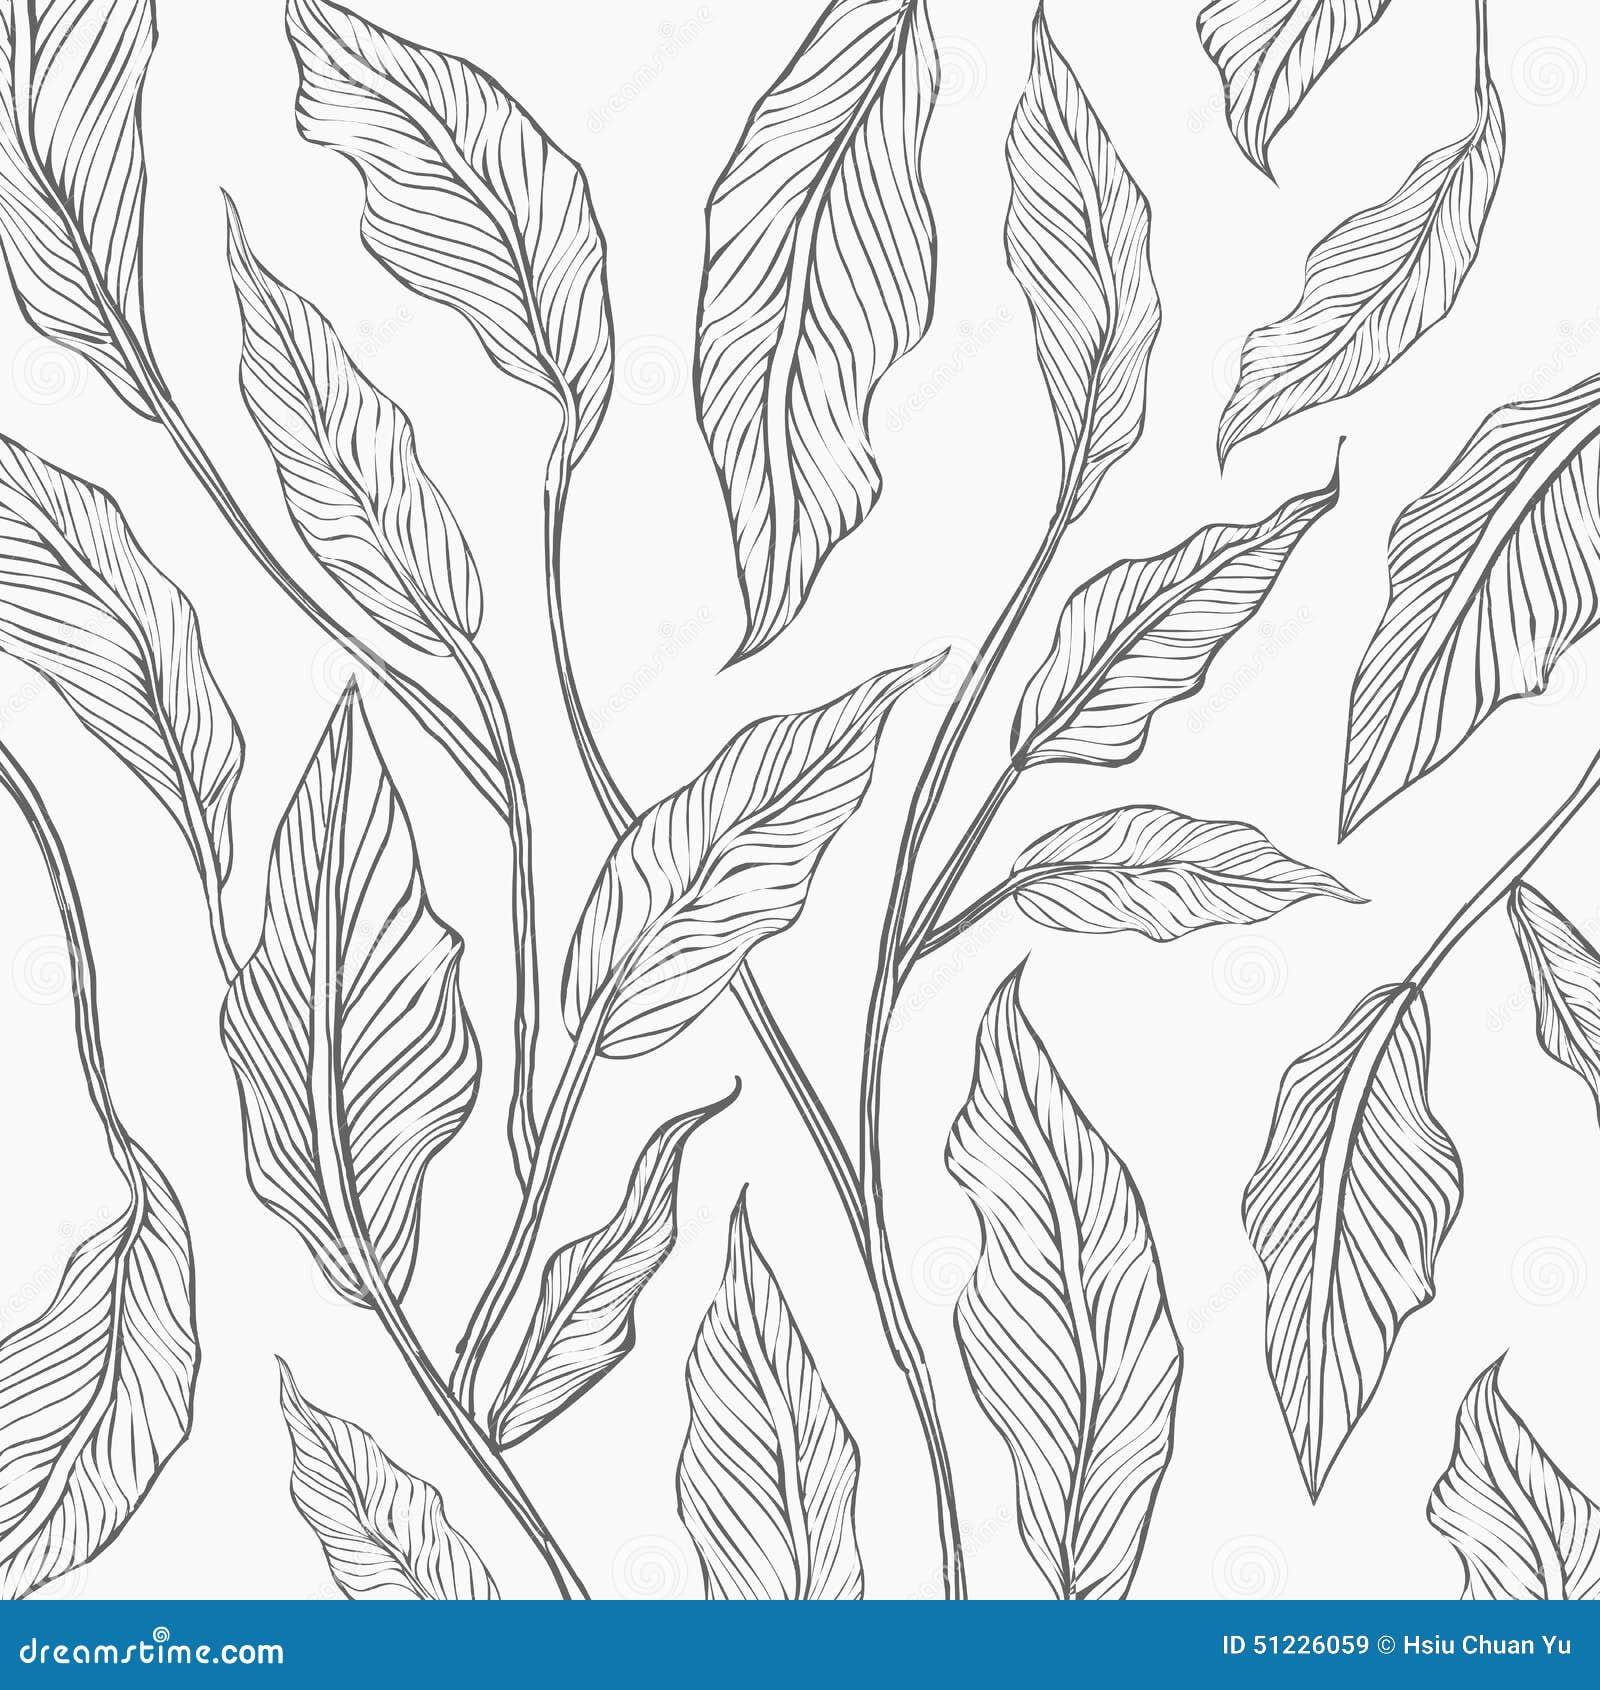 Background Of Gray Line Leaf Sketch Stock Vector - Image